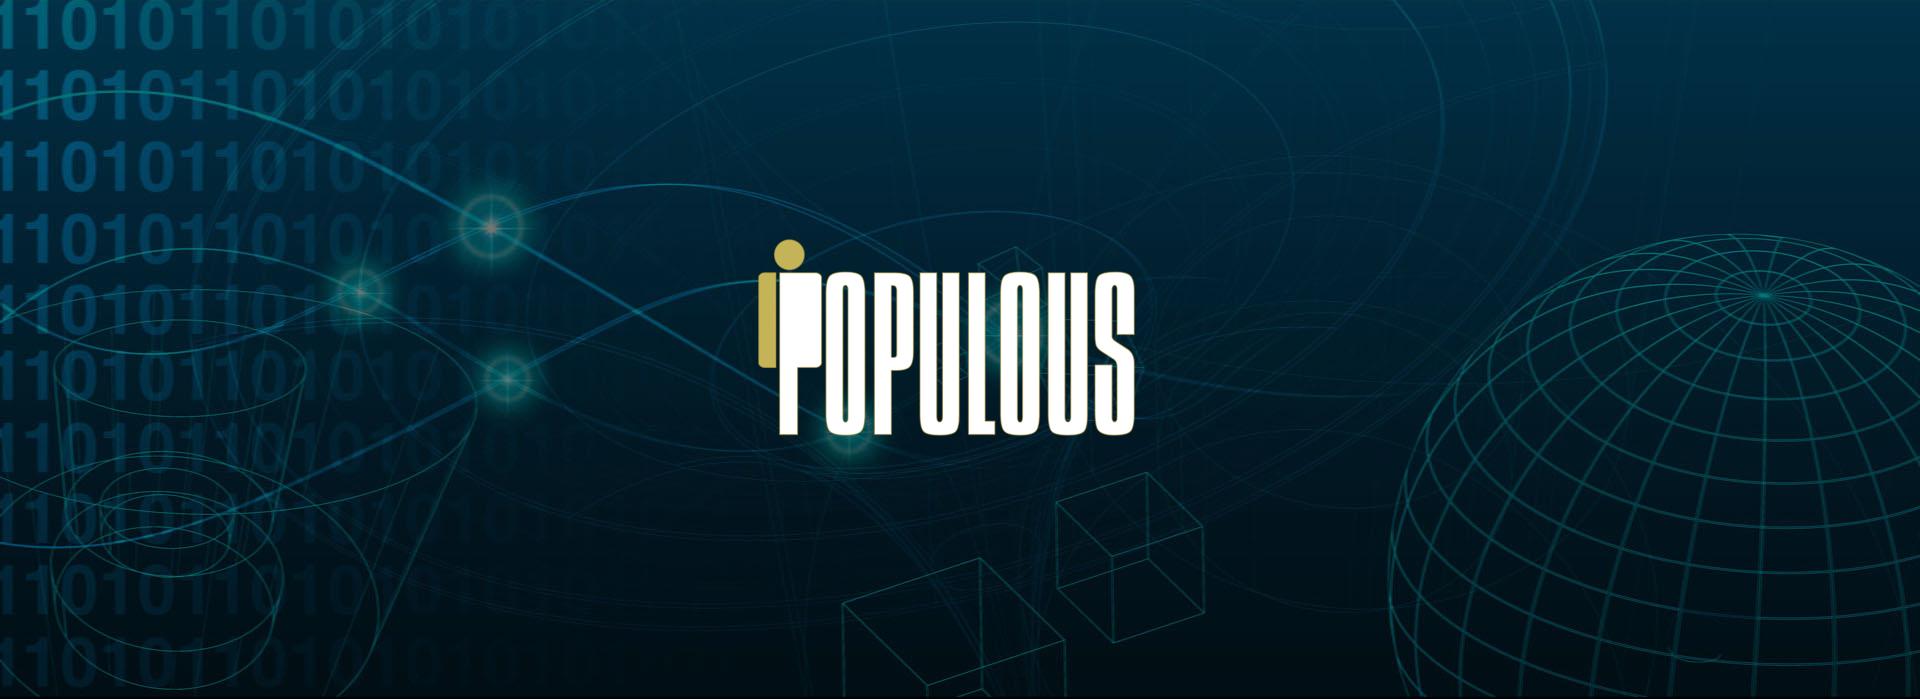 Криптовалюта Populous (PPT)